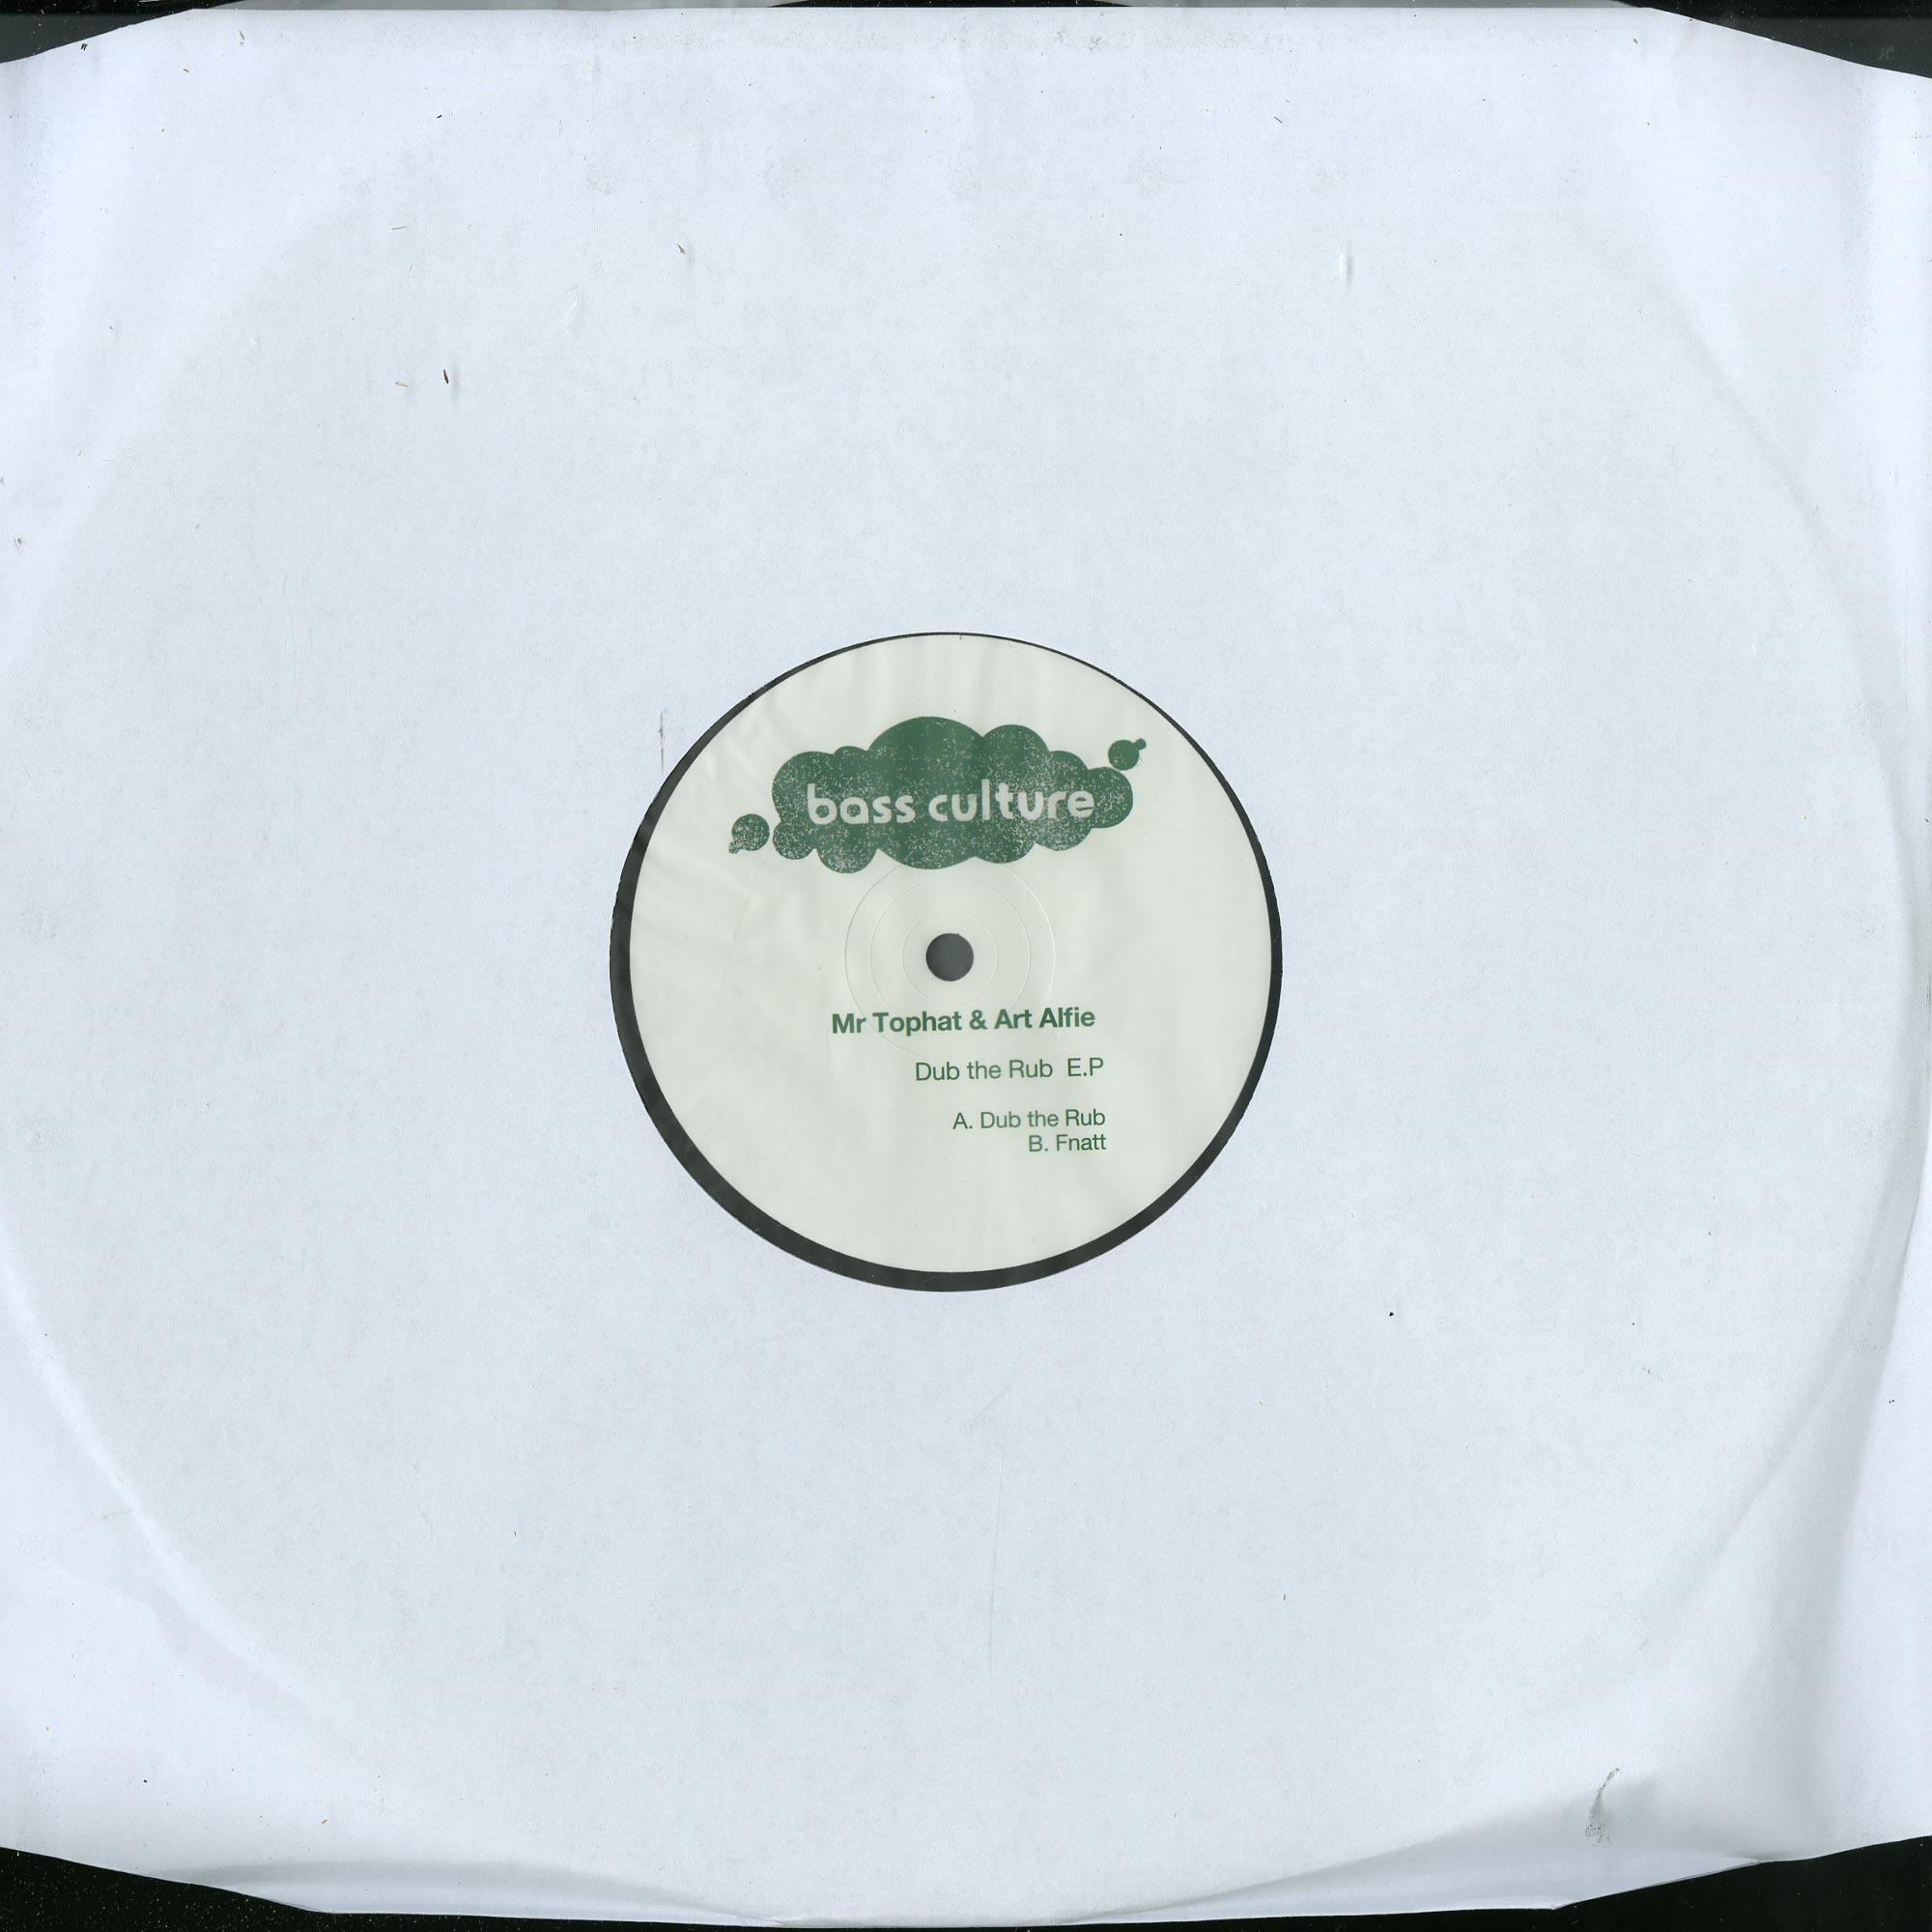 Mr Tophat & Art Alfie - DUB THE RUB EP